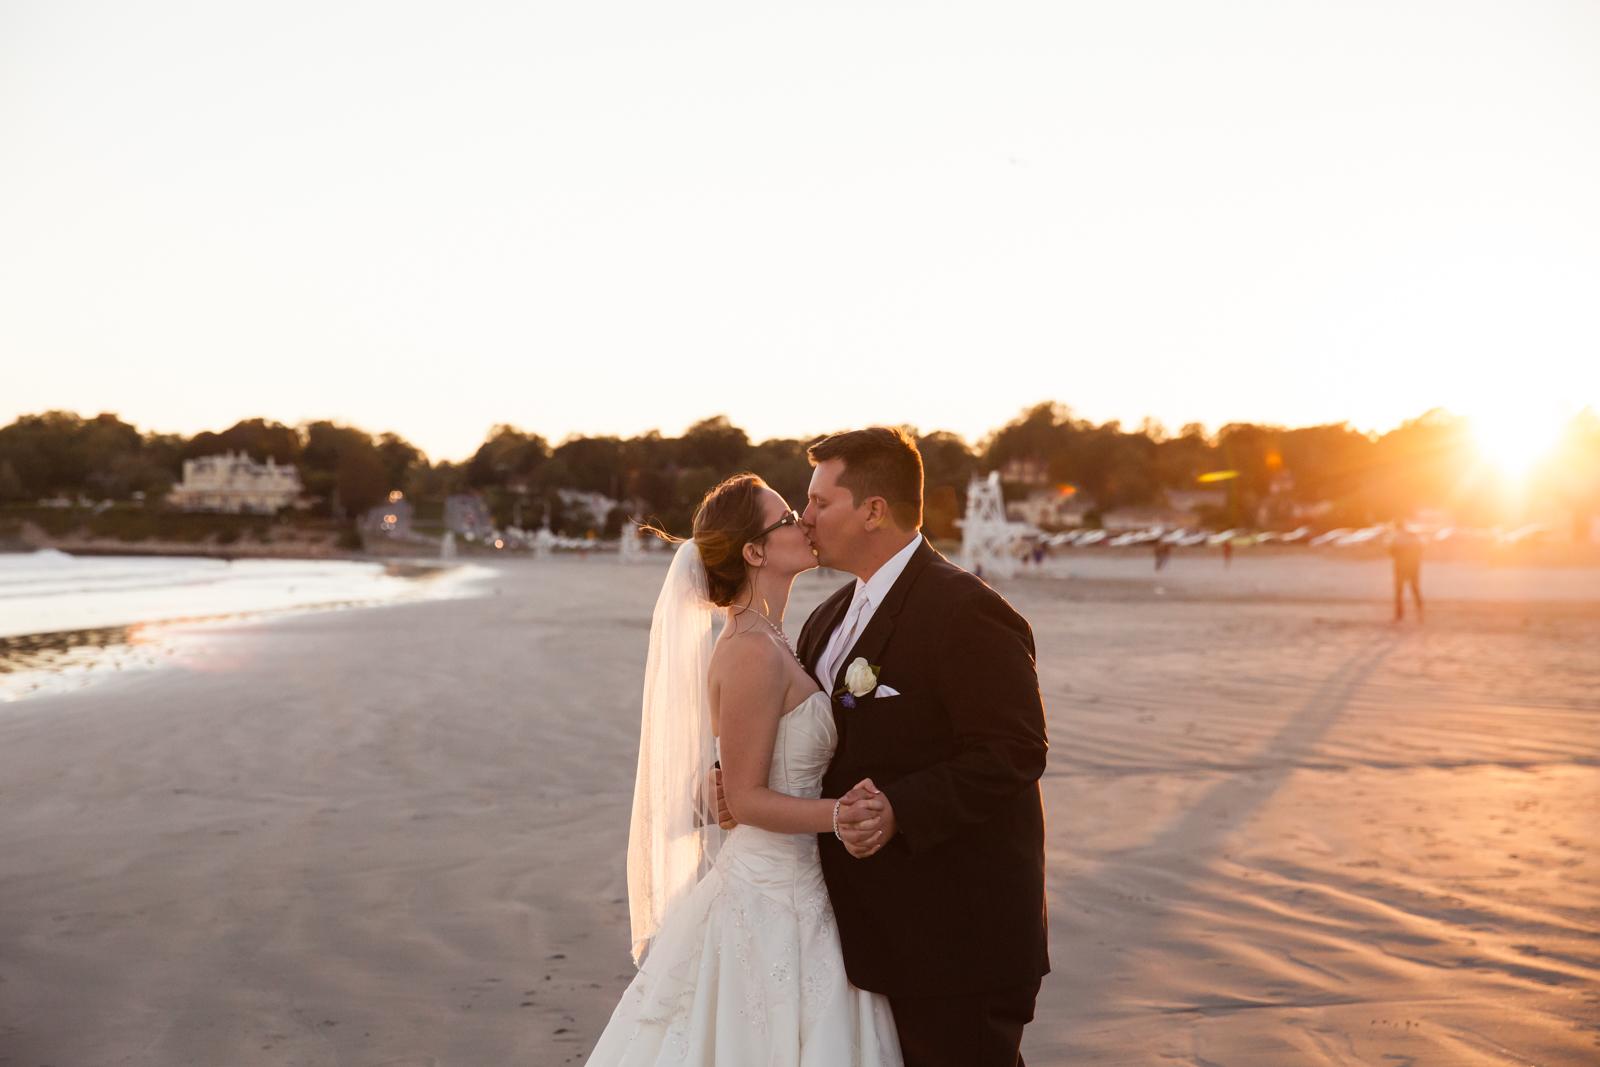 Eastons-Beach-Rotunda-Ballroom-Wedding-Newport-Rhode-Island-PhotographybyAmandaMorgan-91.jpg